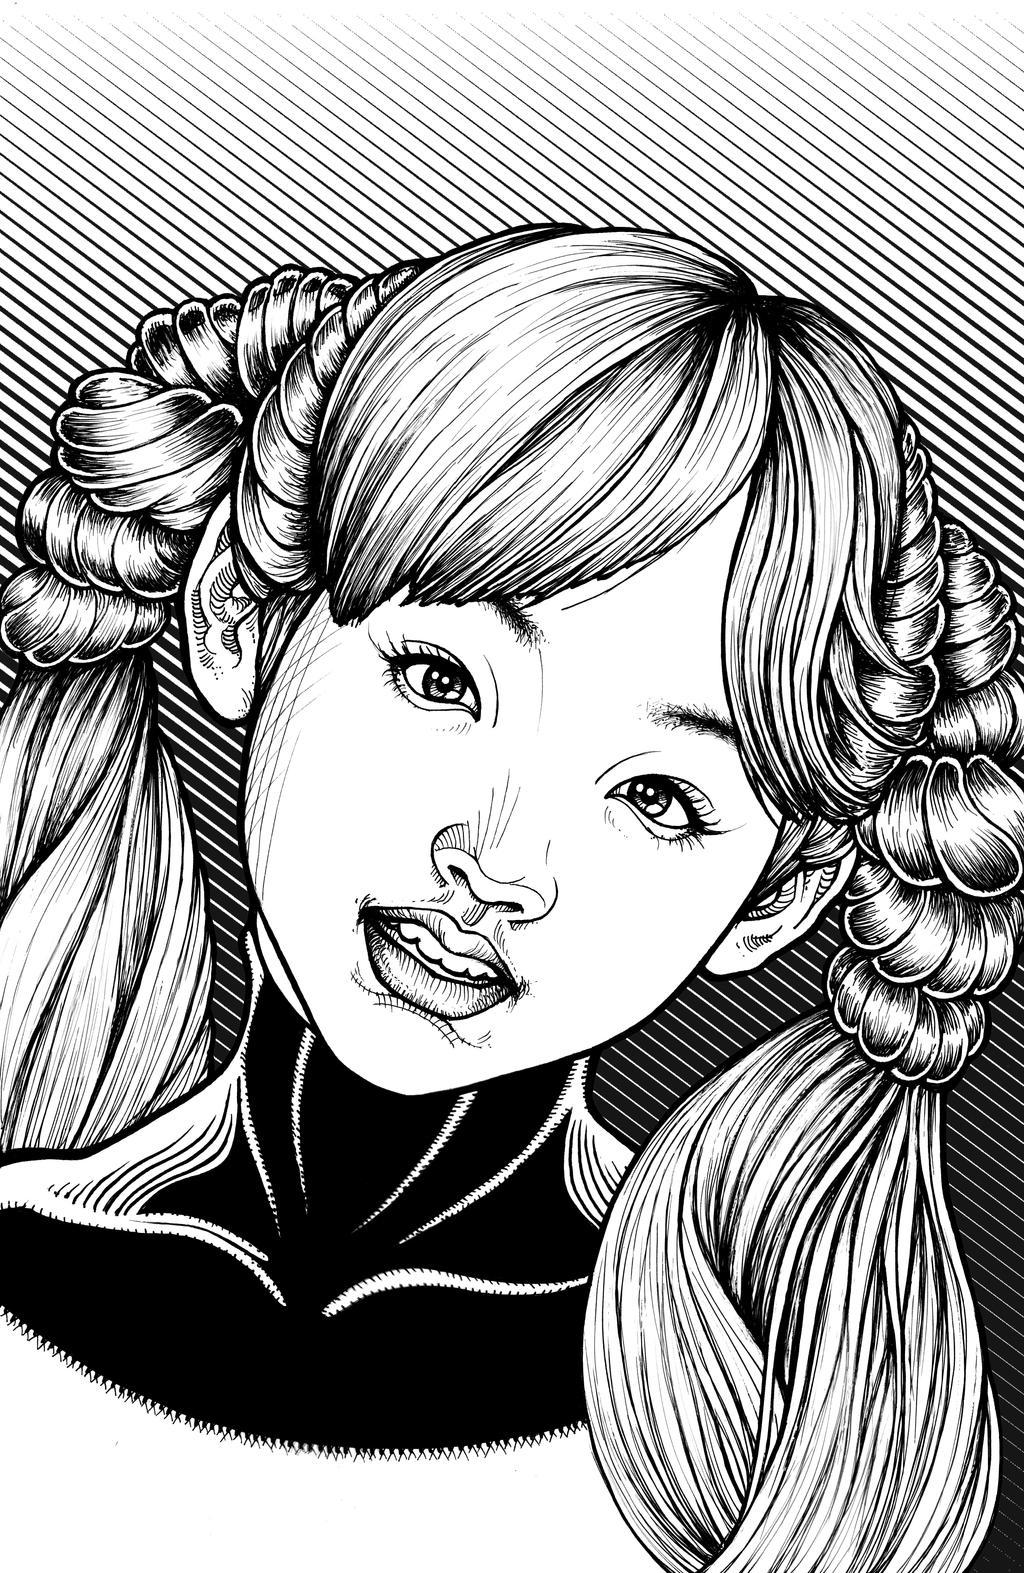 Kaneko miho Miho Kaneko